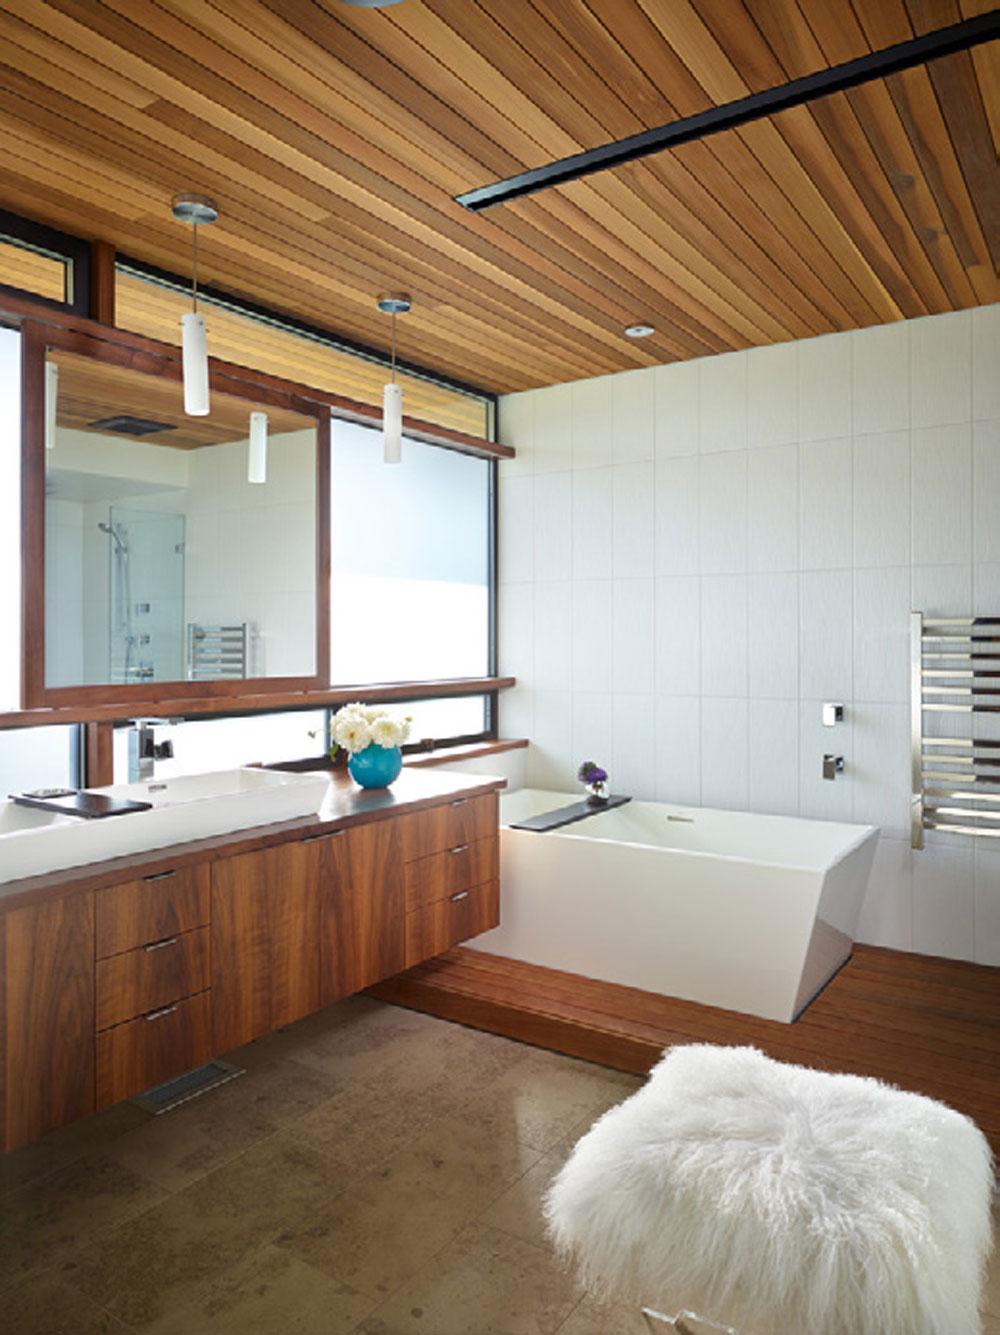 A-collection-of-bathroom-floor-tile-ideas-8 A collection of bathroom-floor-tile-ideas